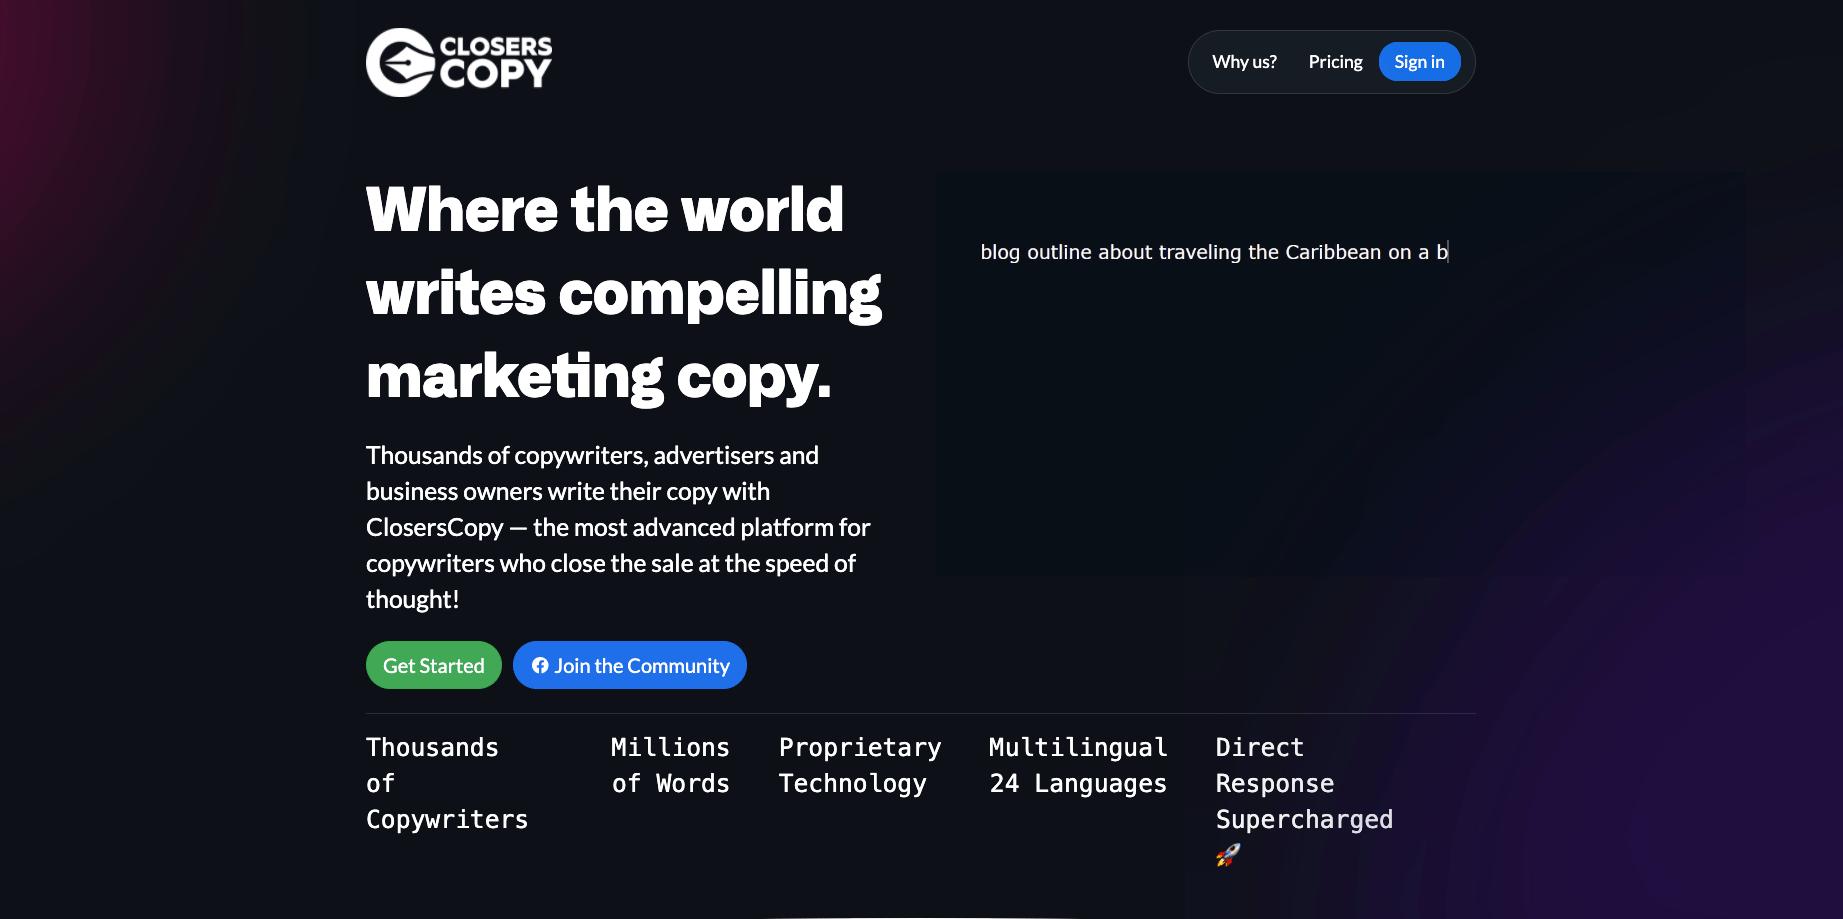 ClosersCopy